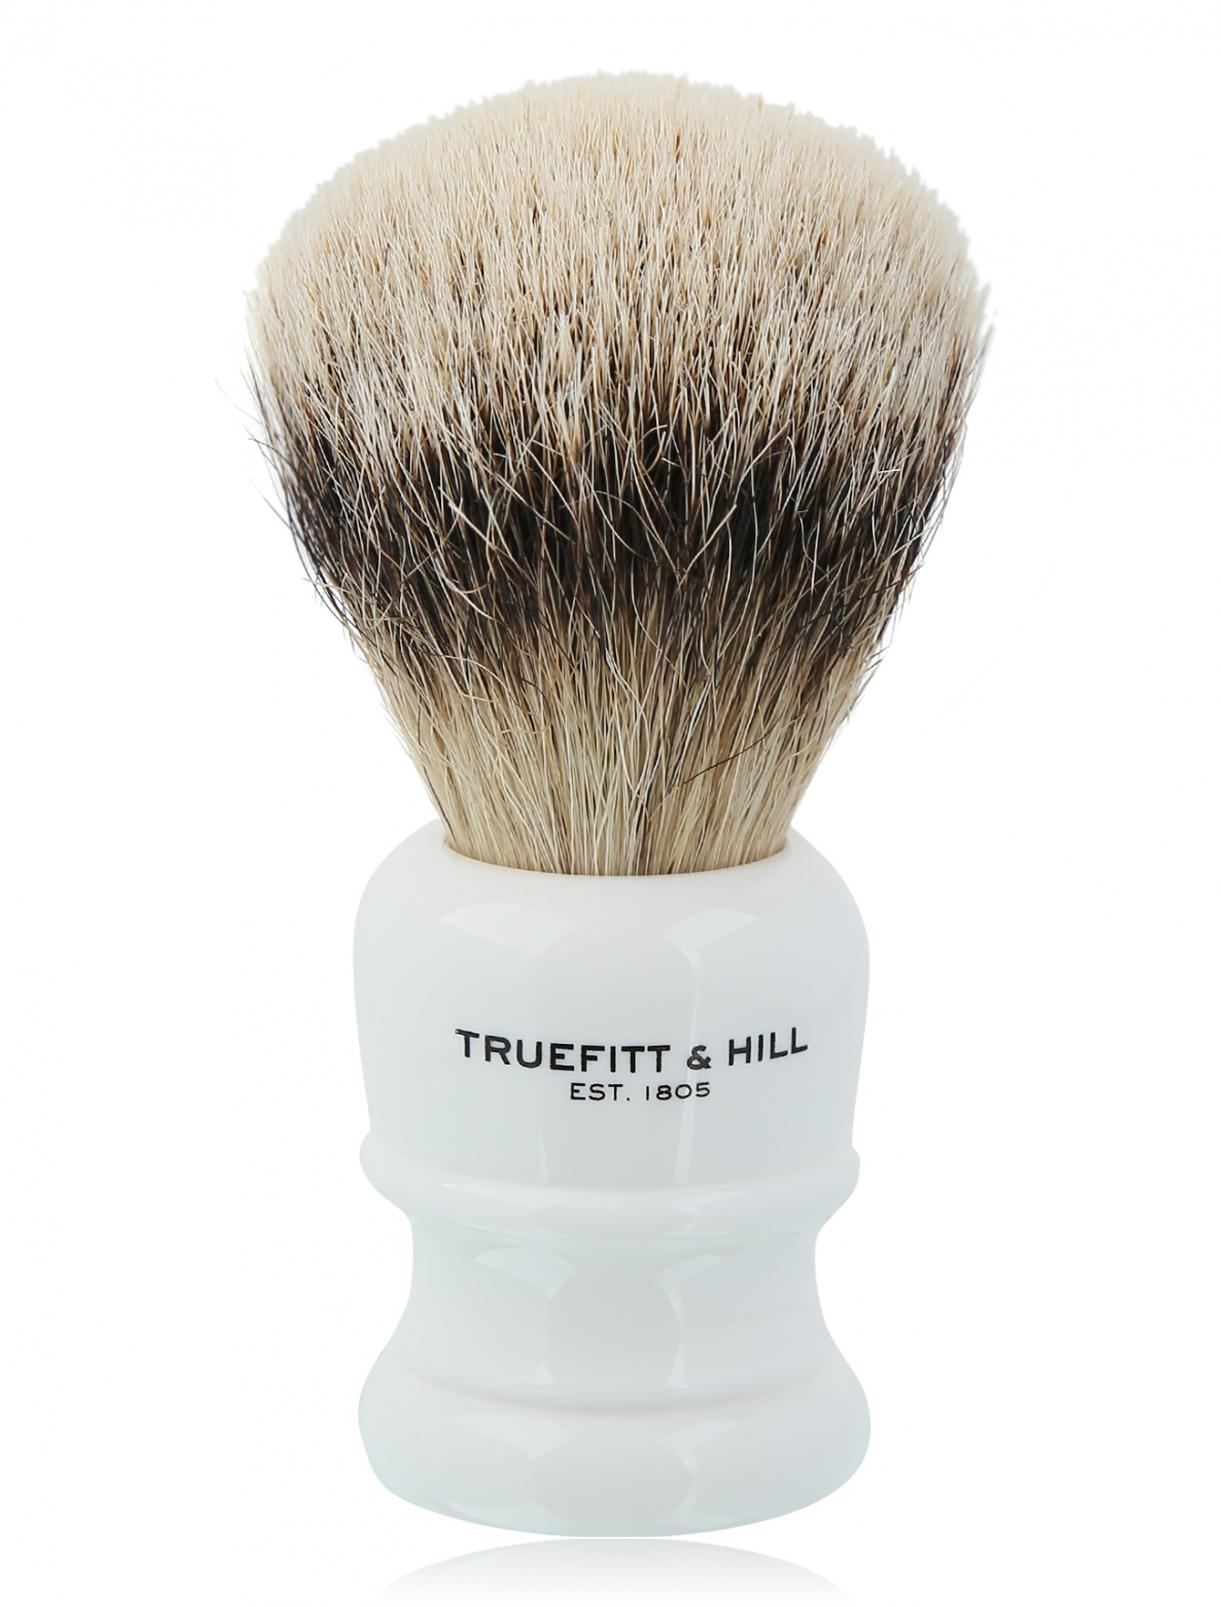 Кисть для бритья - Truefitt & Hill Truefitt & Hill  –  Общий вид